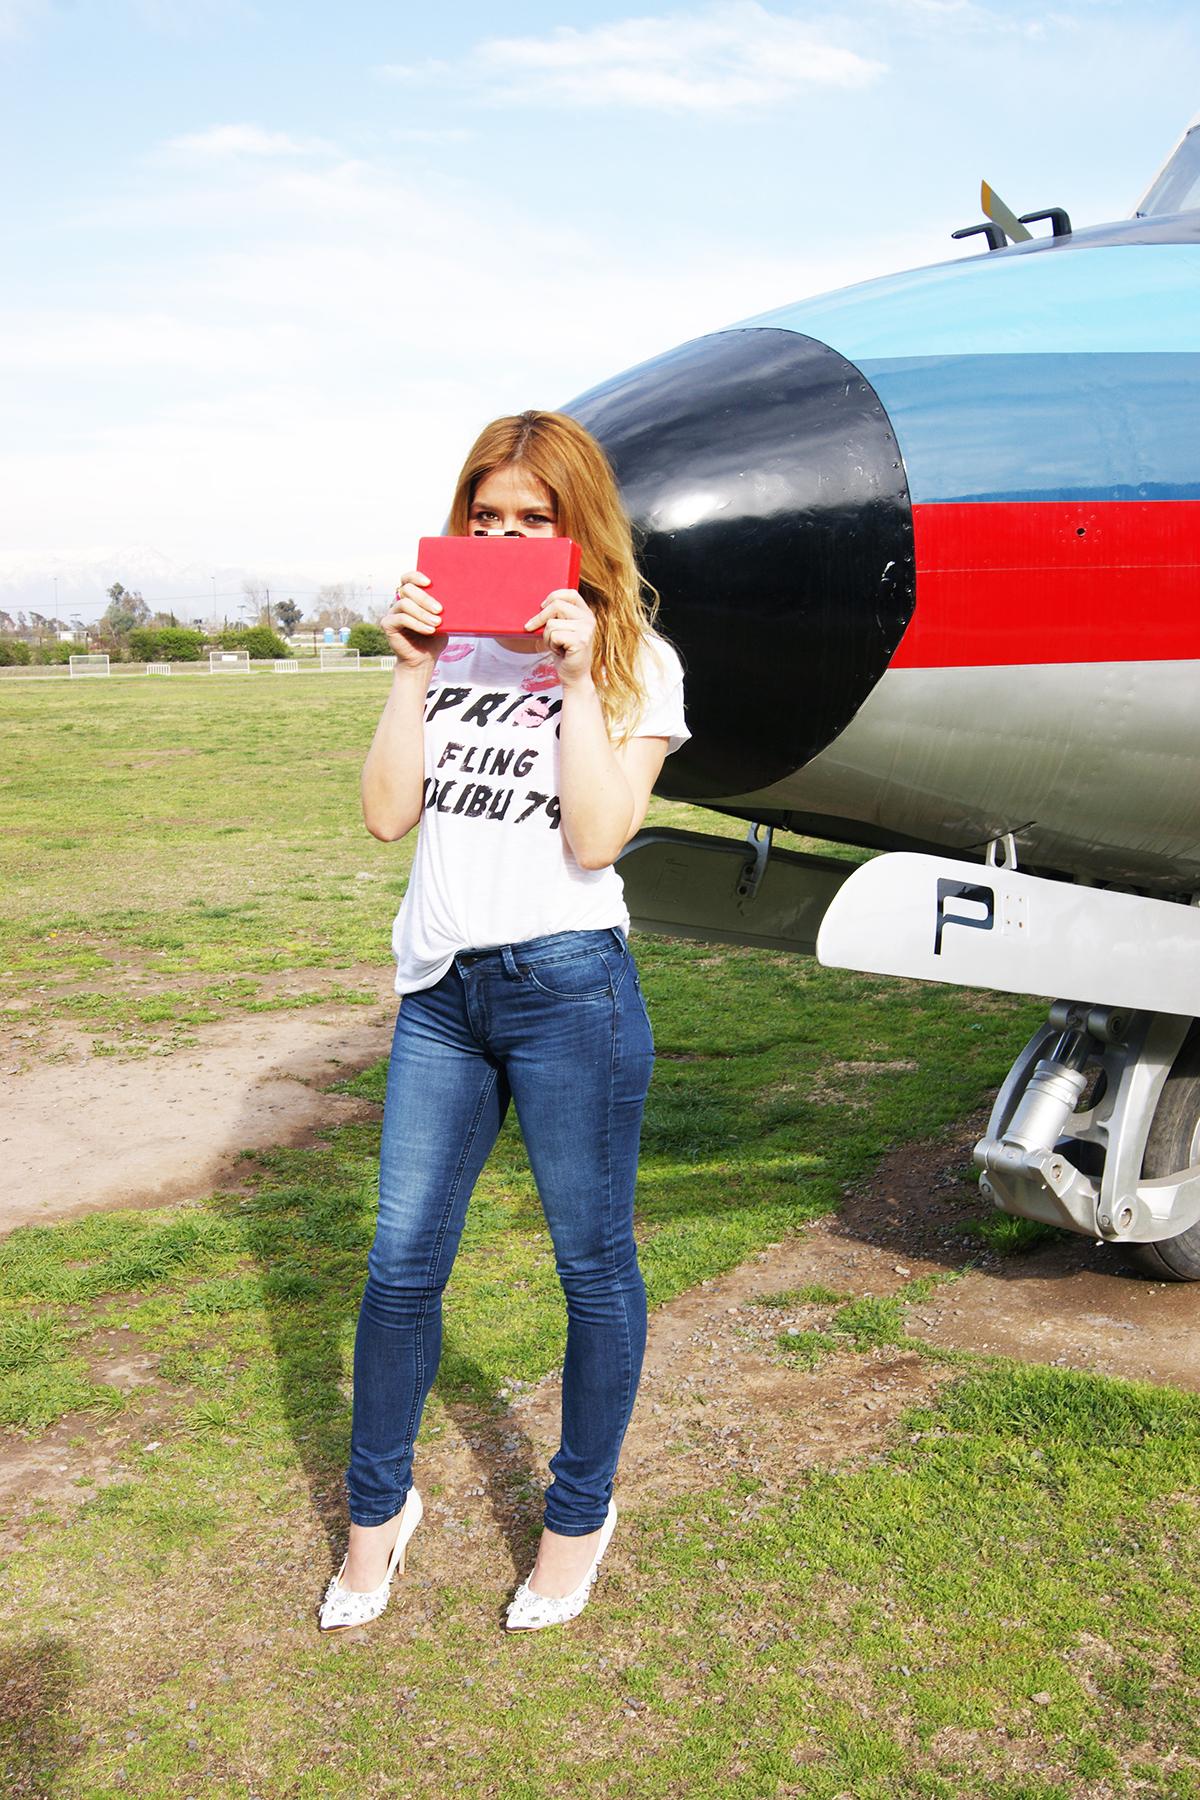 Spring flying Malibu AeronauticsMuseum